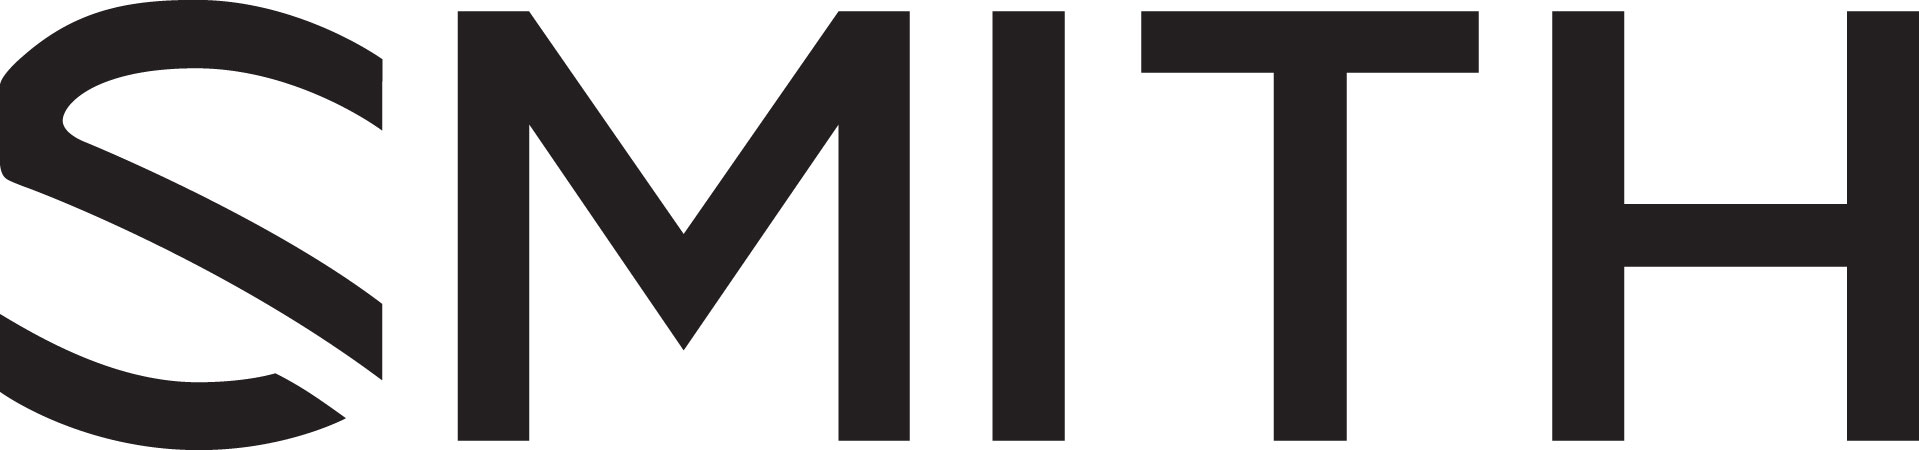 smith-optics.jpg